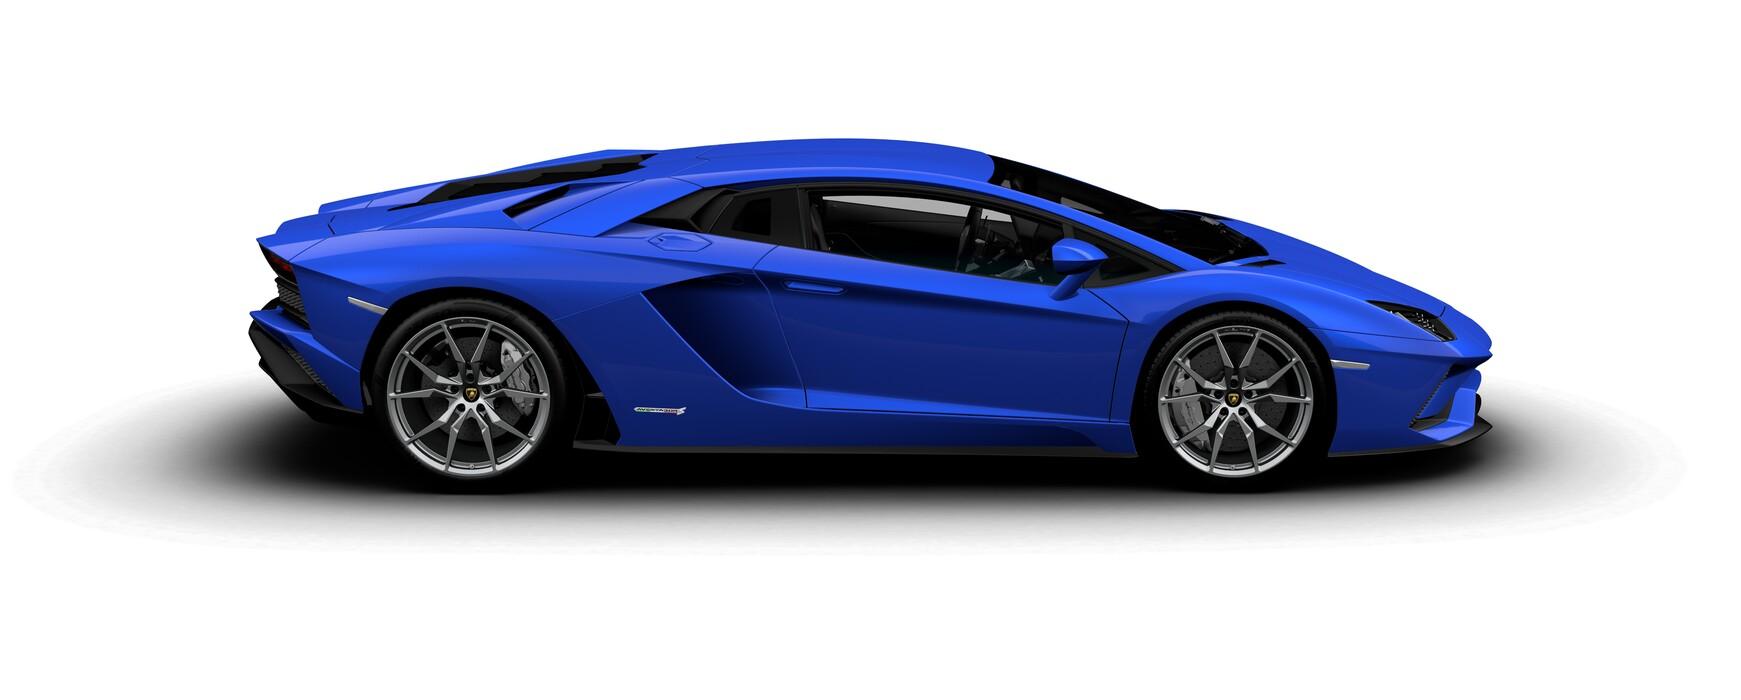 Lamborghini Aventador S Coupe metallic Blu Nila side view